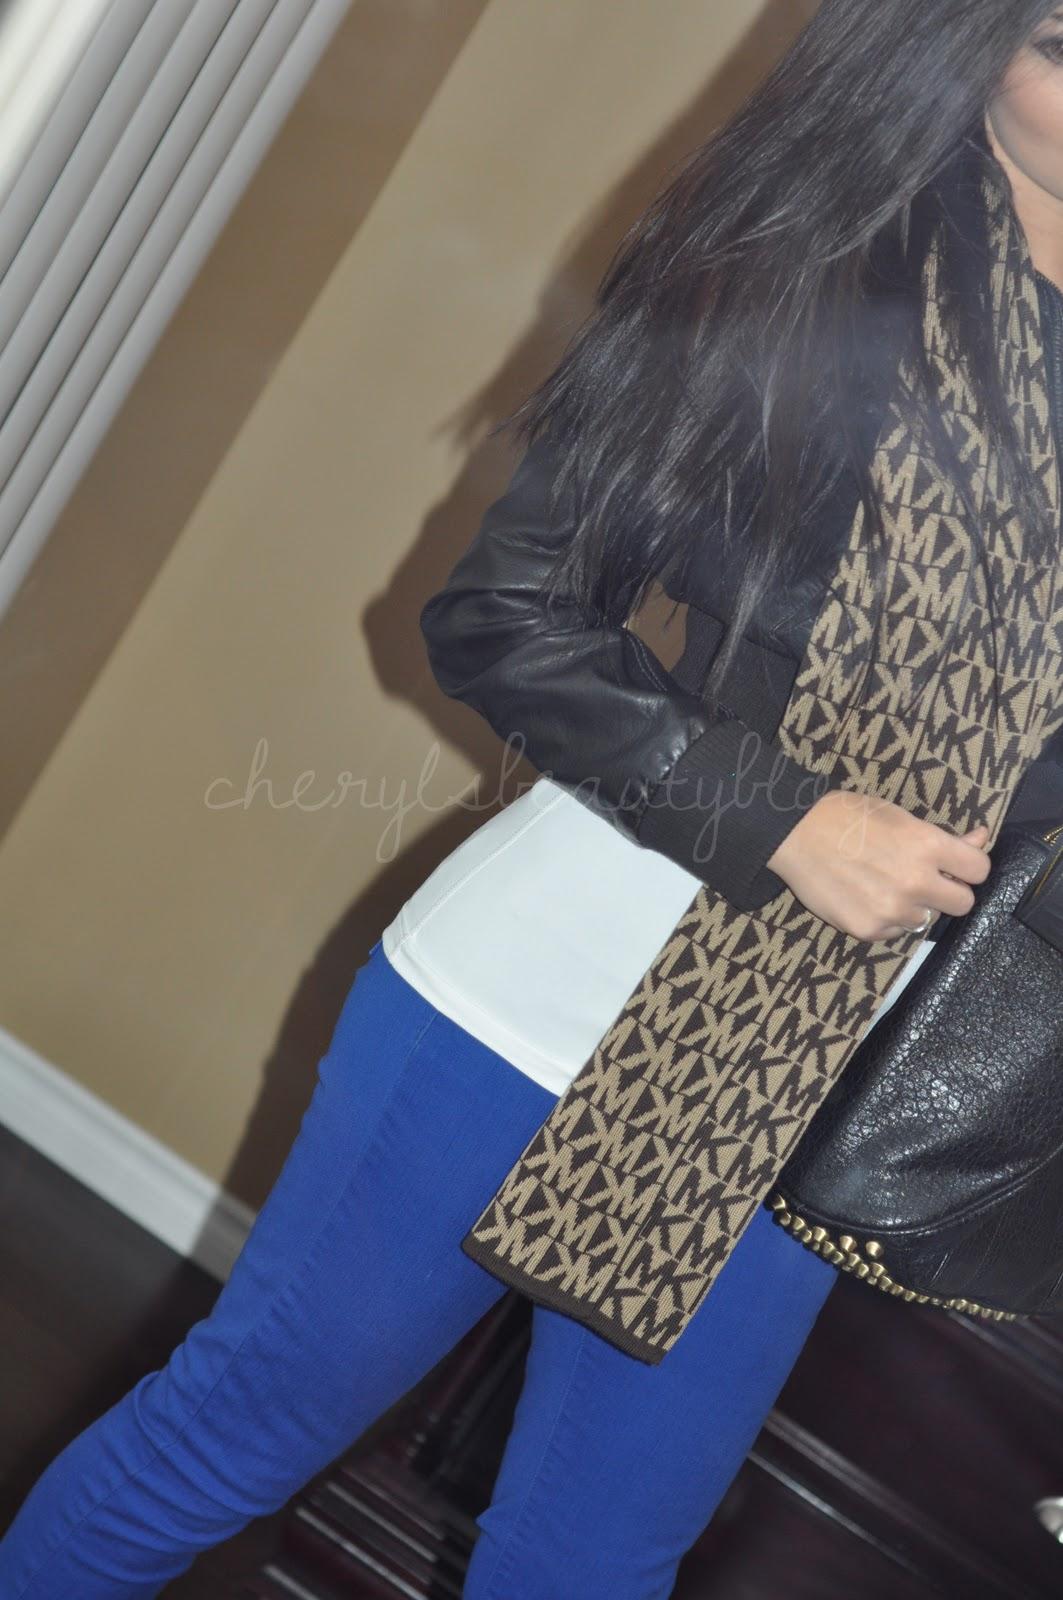 http://3.bp.blogspot.com/-z_X0MDhW-gE/TtLT4sUGwZI/AAAAAAAAEIo/FdDyvGw0n2o/s1600/luxebox+palettes+ootd+019+copy.jpg